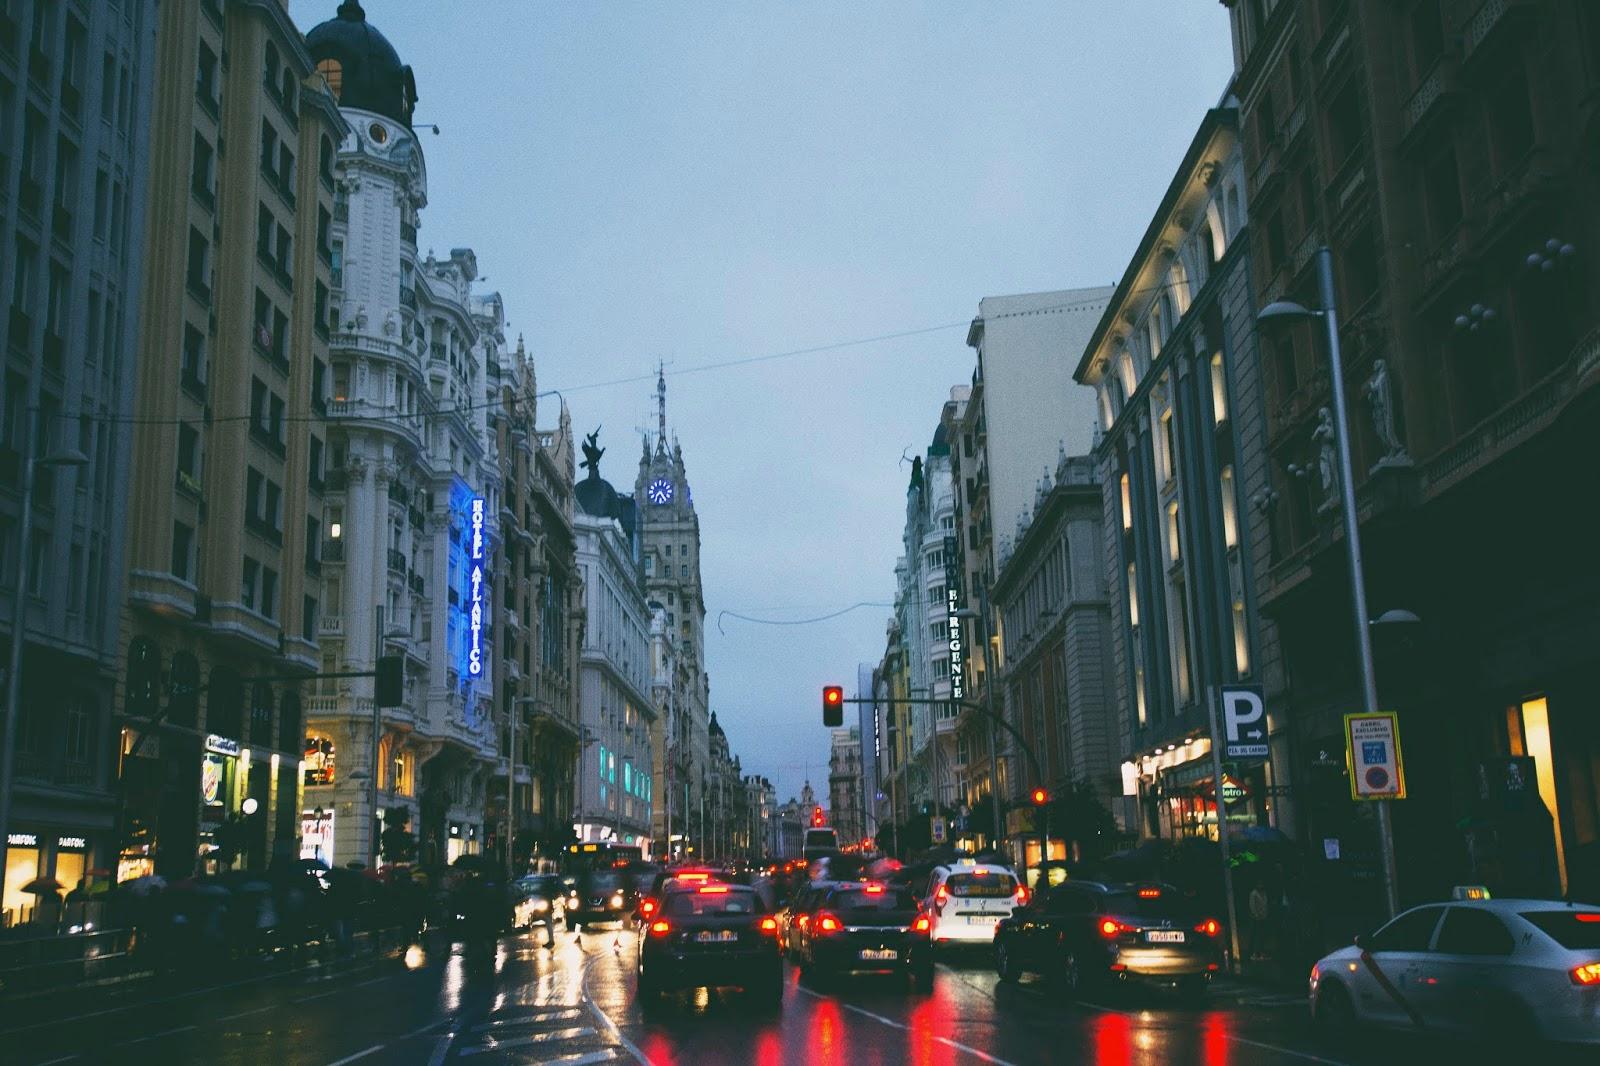 fotografía lluvia